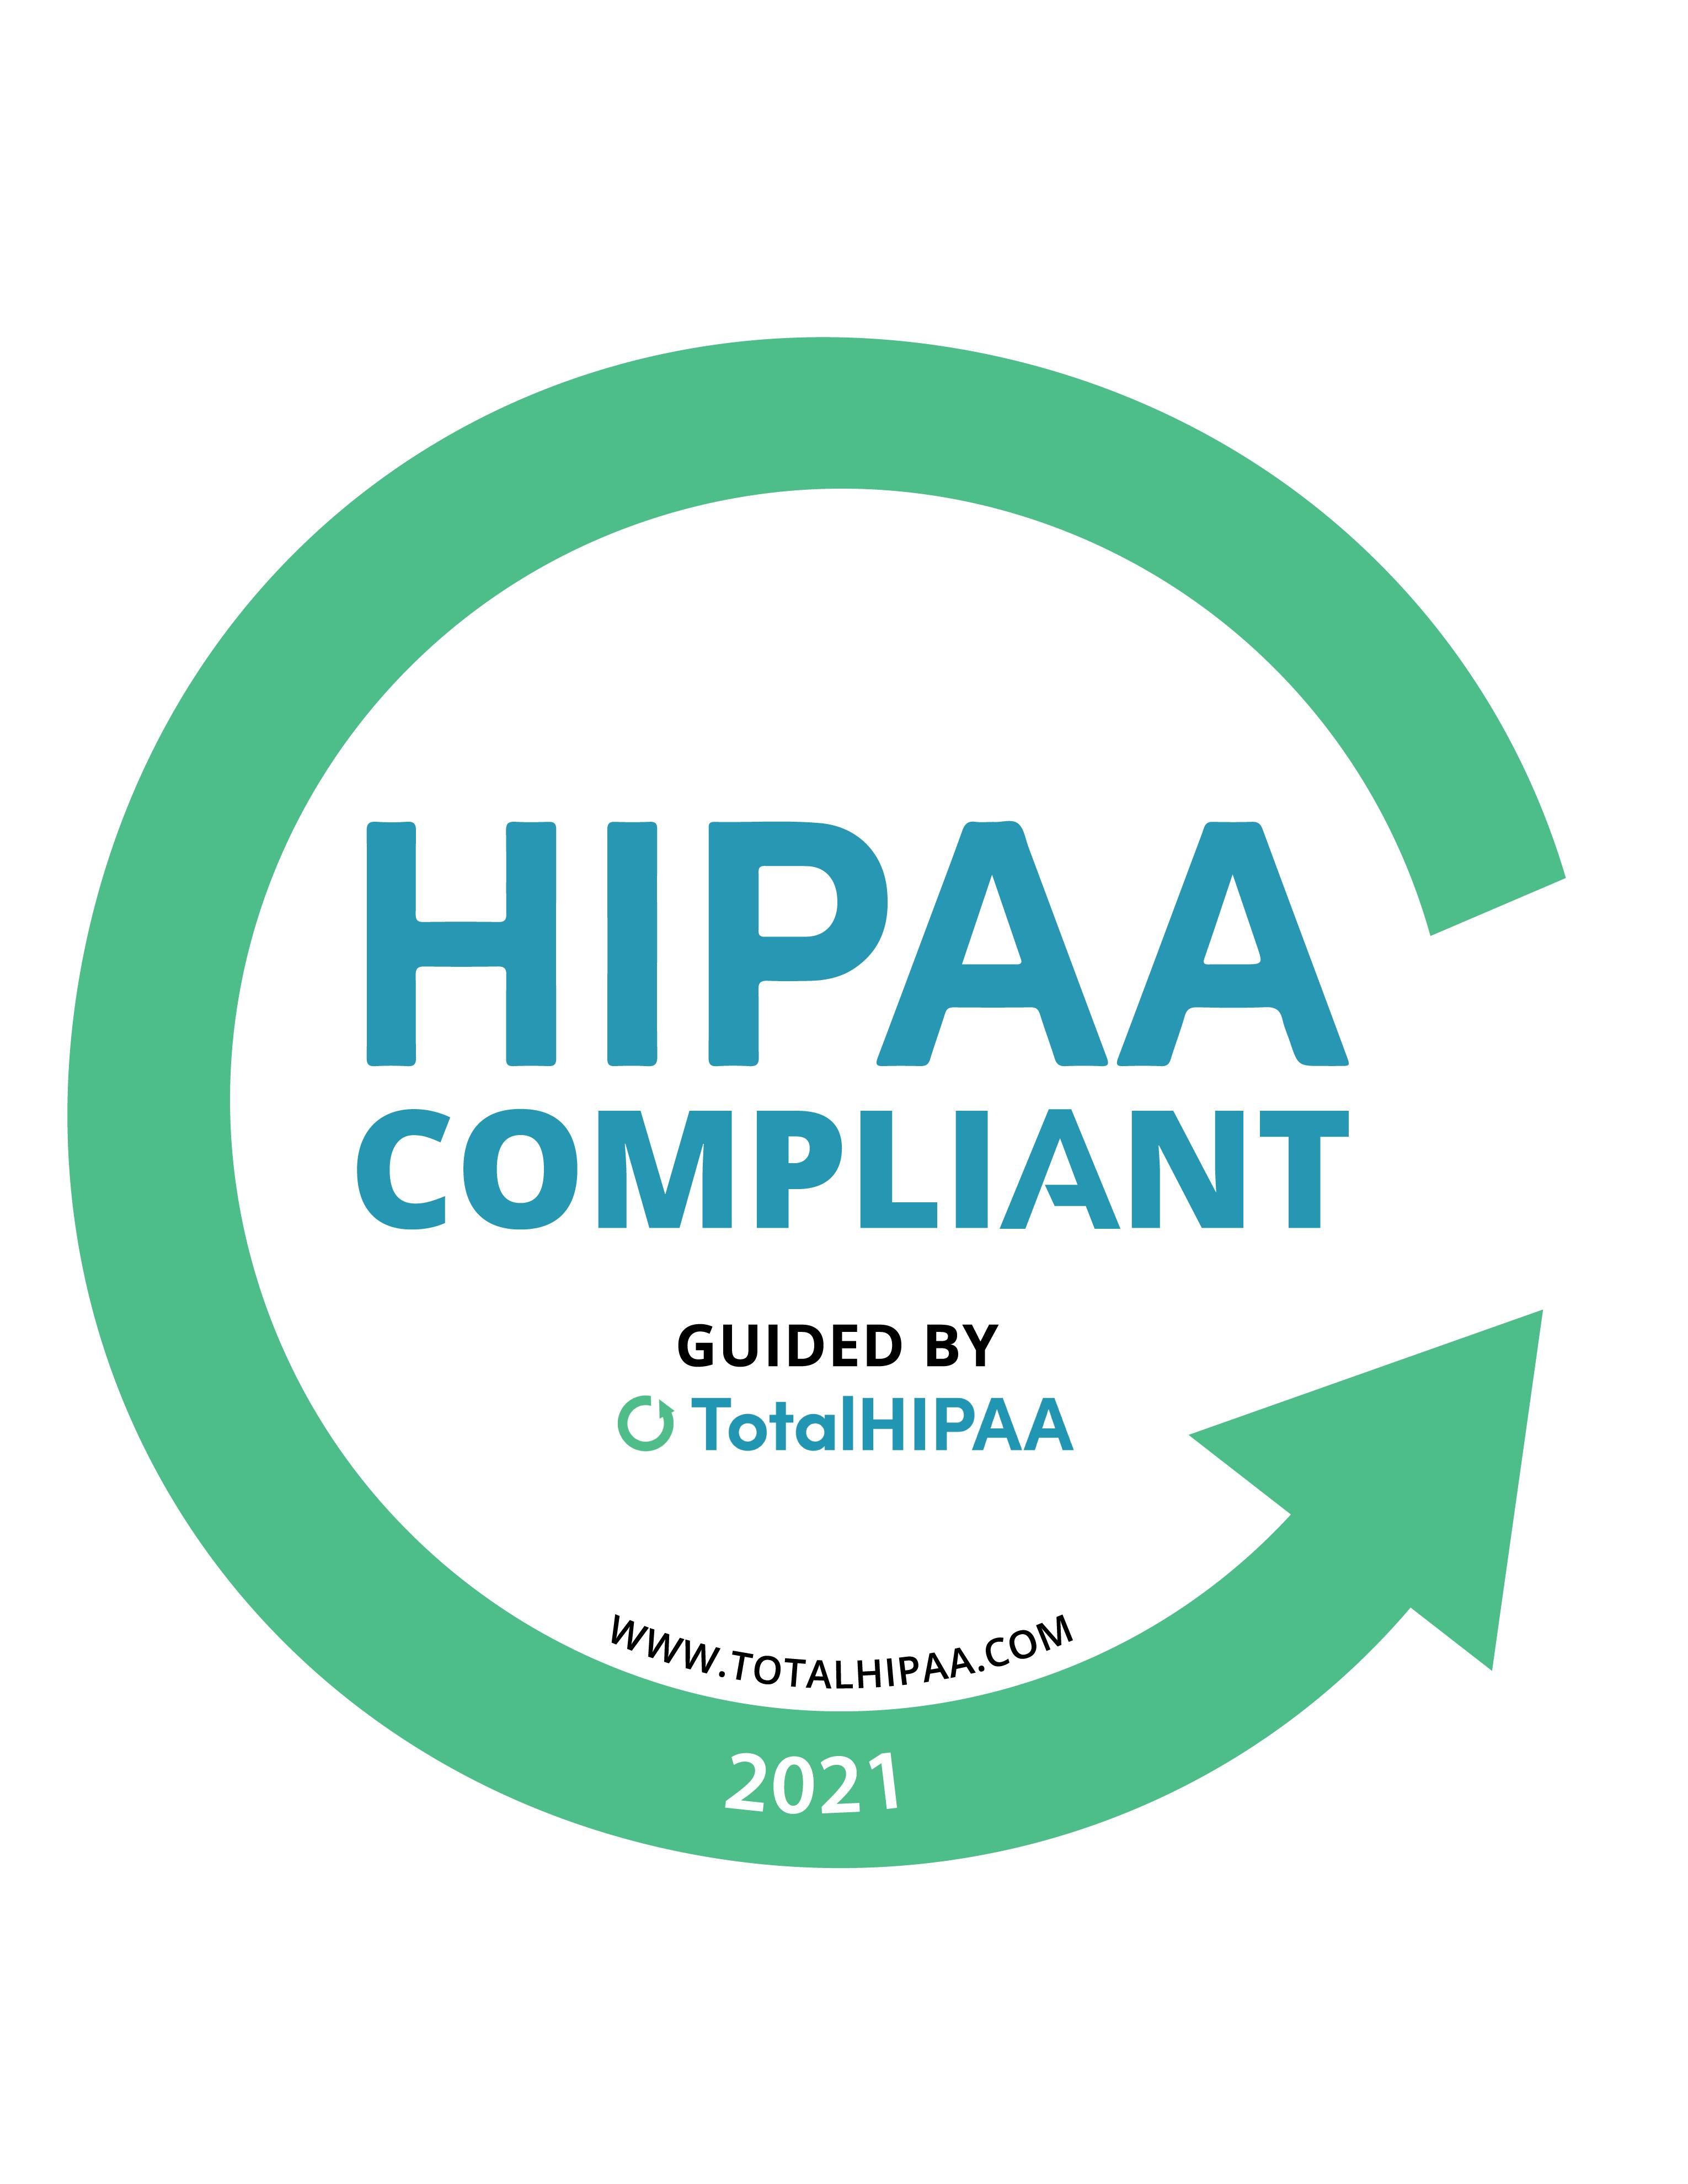 TotalHipaaBadge_2021